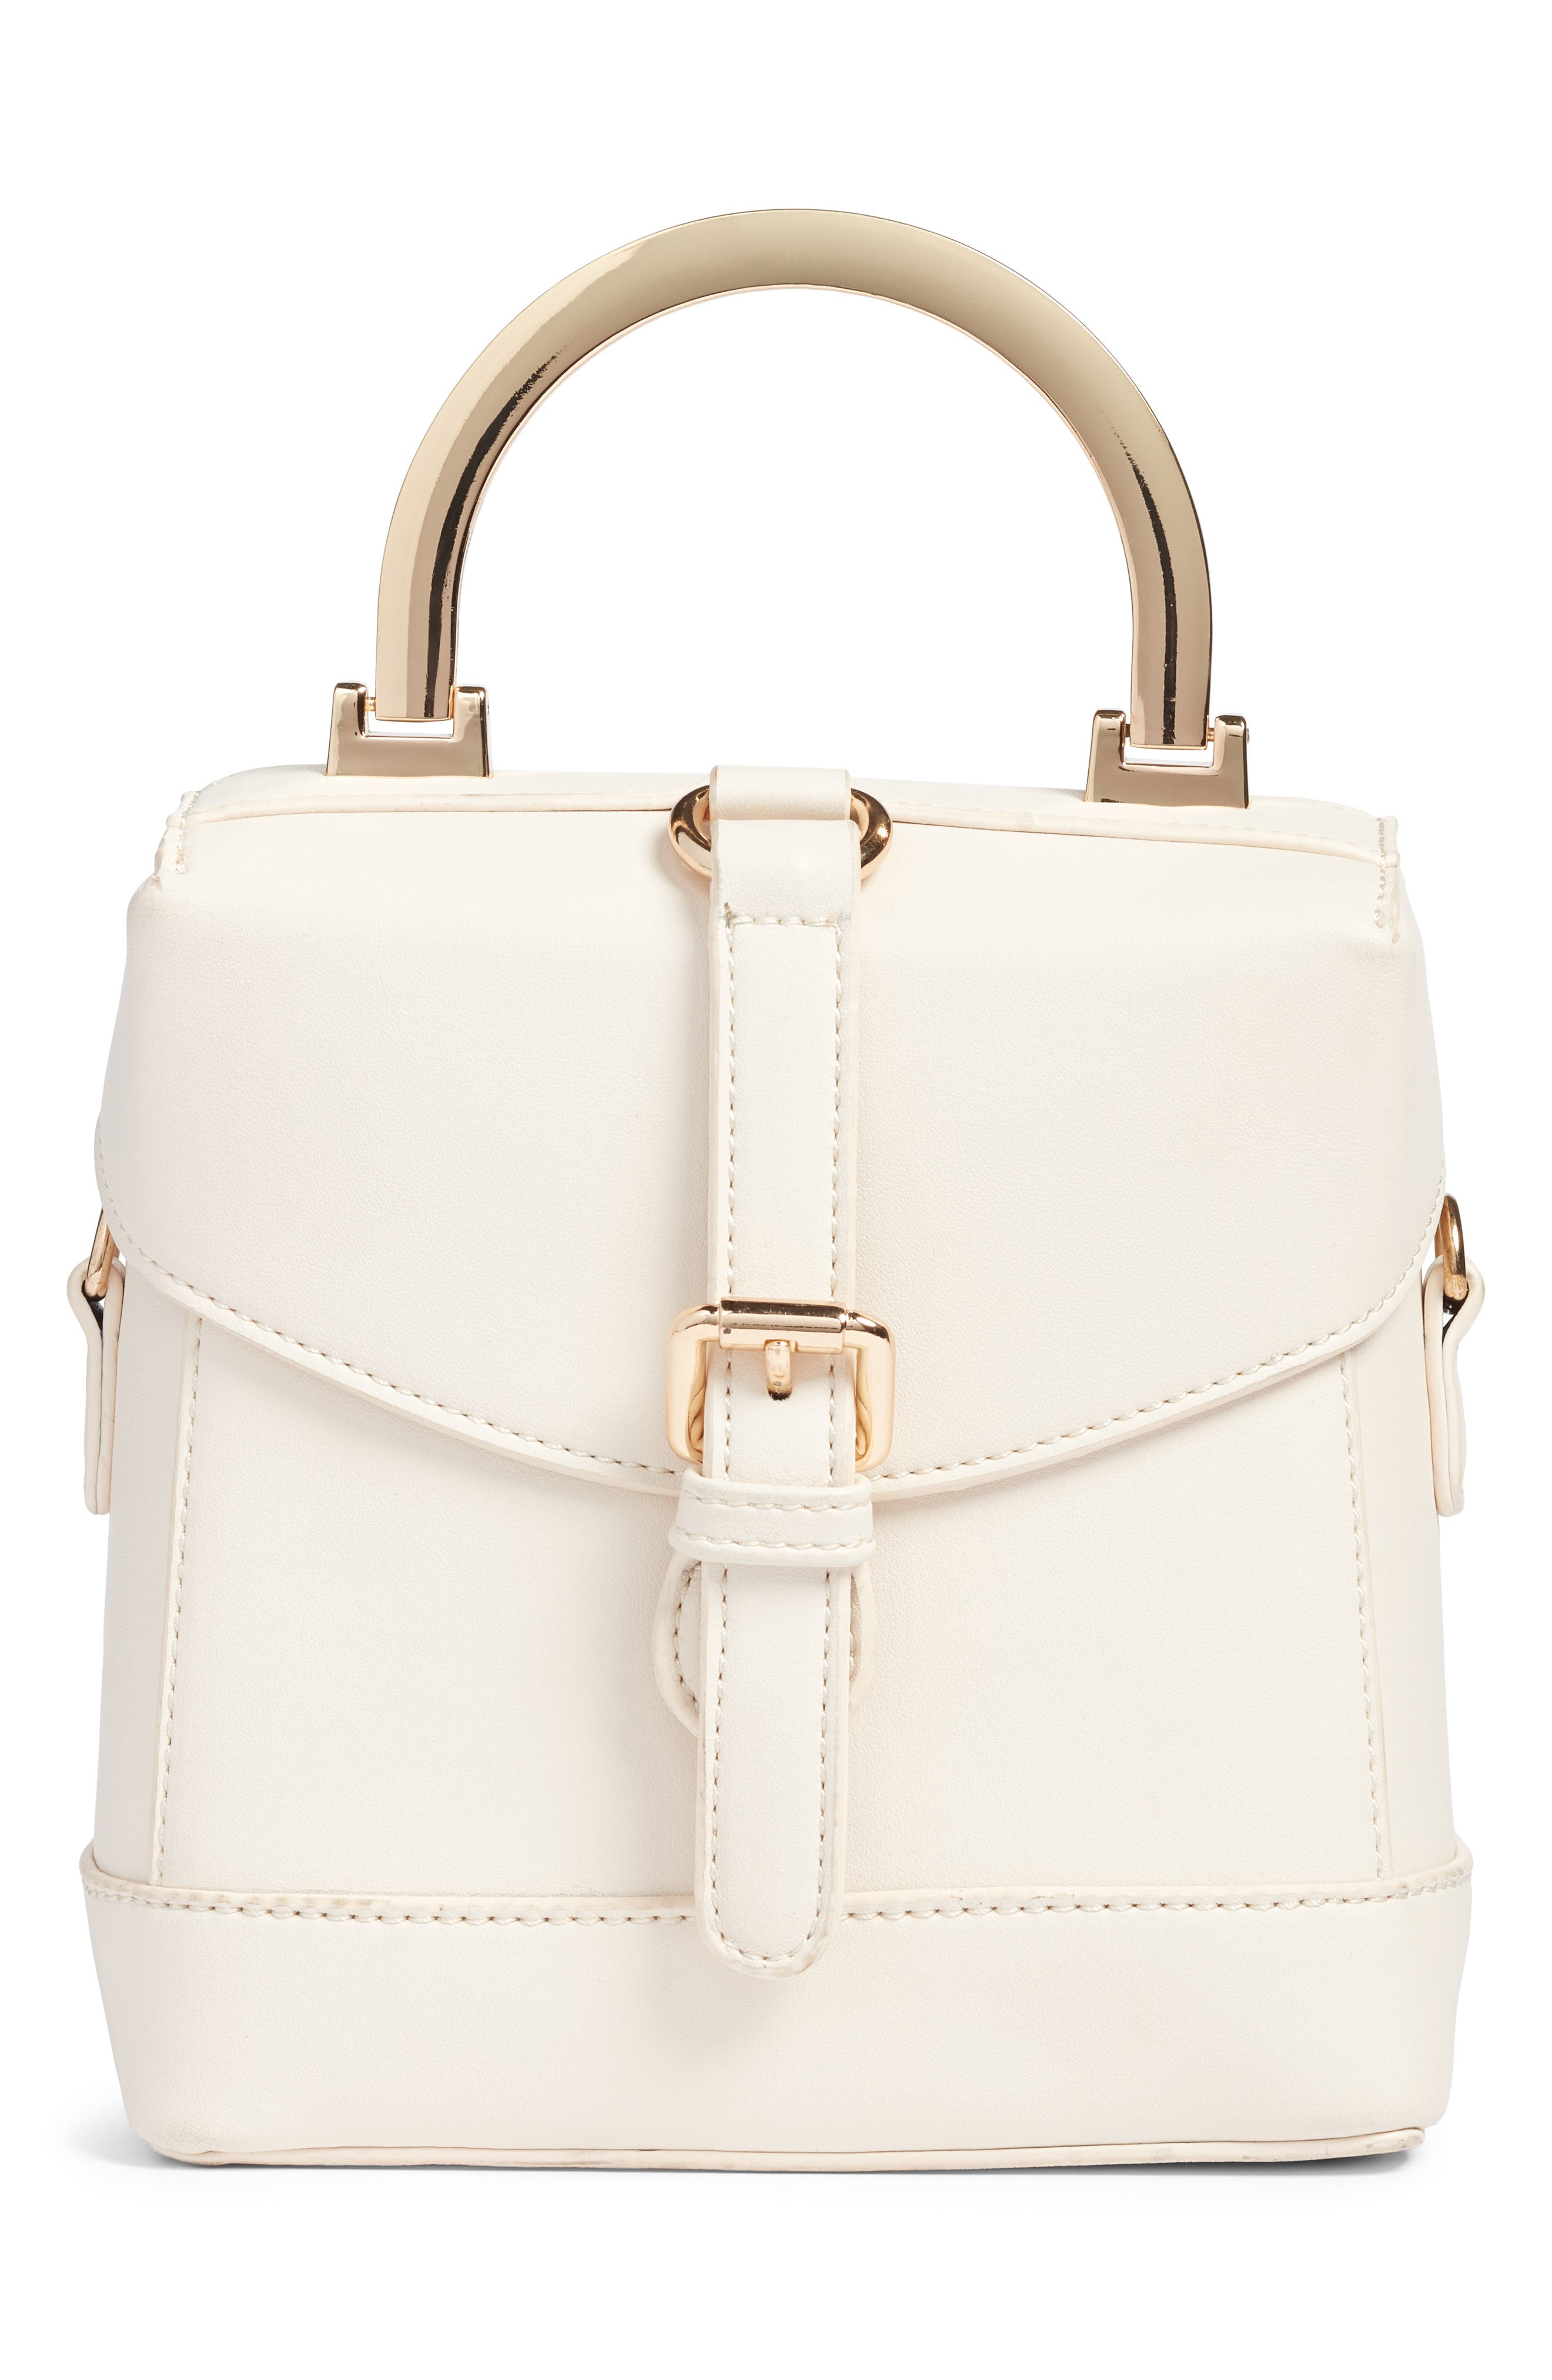 STREET LEVEL Top Handle Studded Bag - White